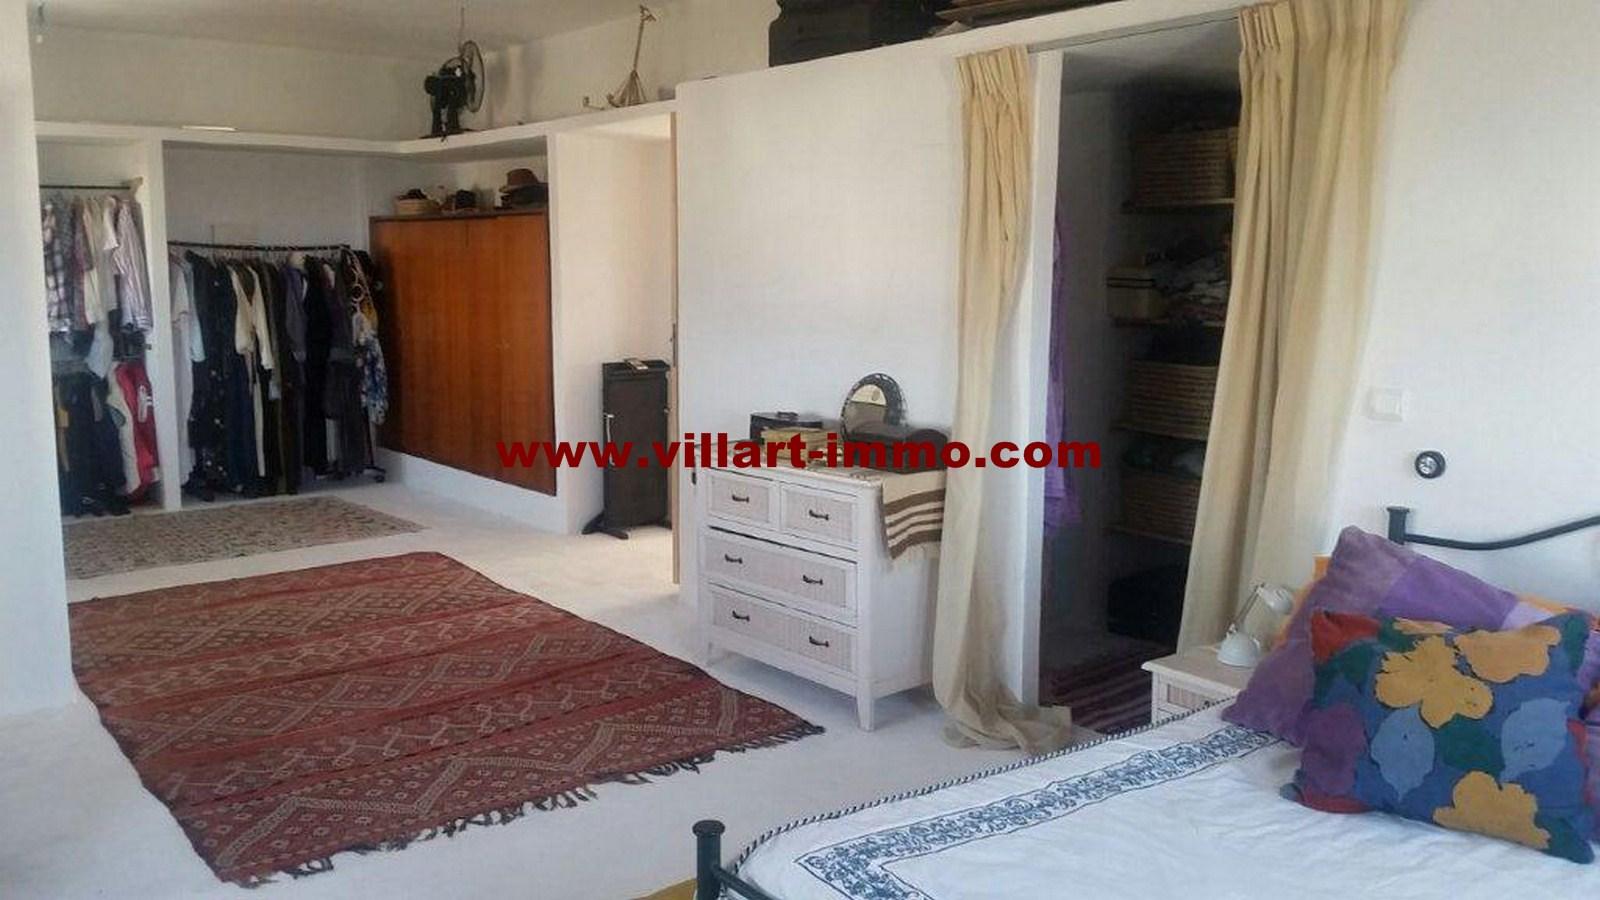 9-vente-villa-tanger-autres-chambre-1-vv454-villart-immo